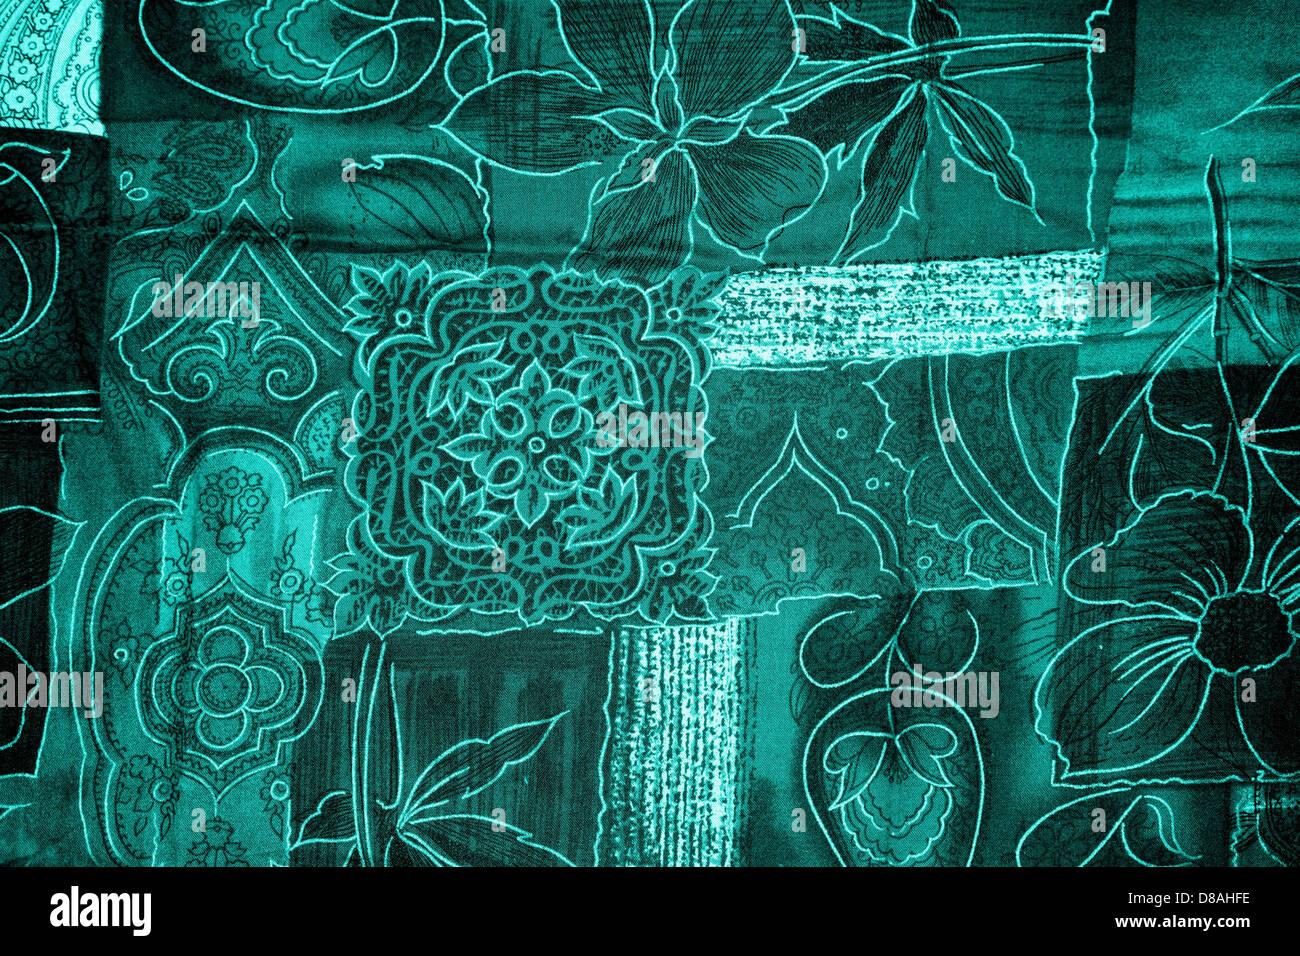 Mattonelle cucina texture gallery of migliori immagini su cerdisa